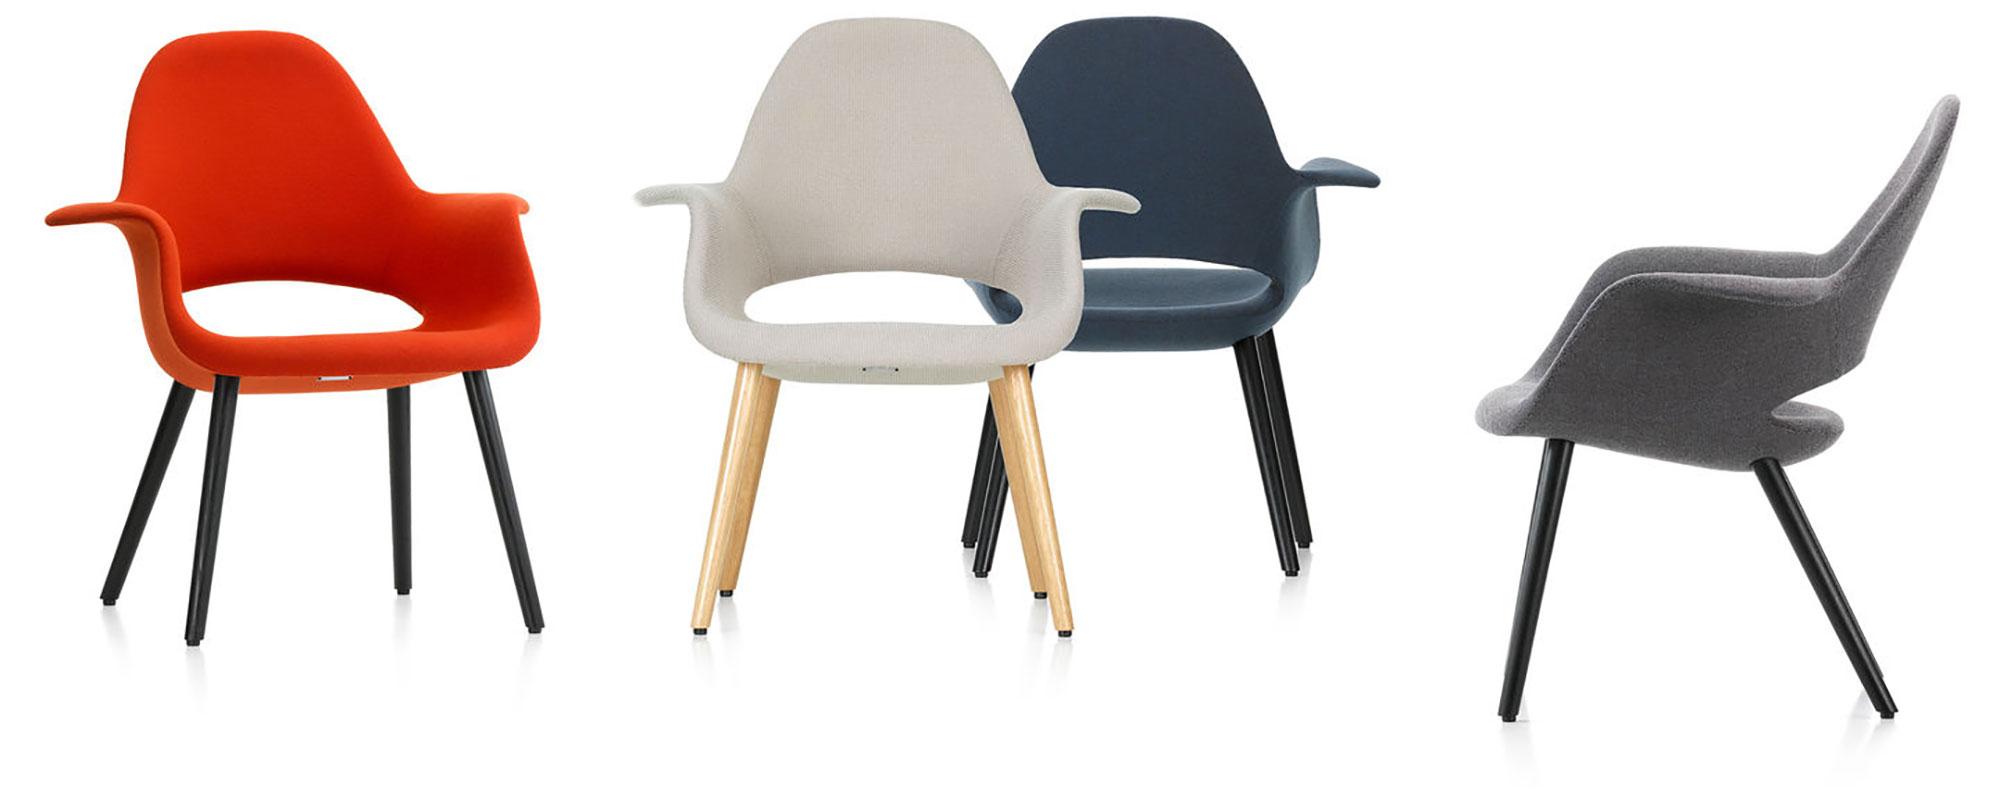 VITRA Organic chair gallery 1